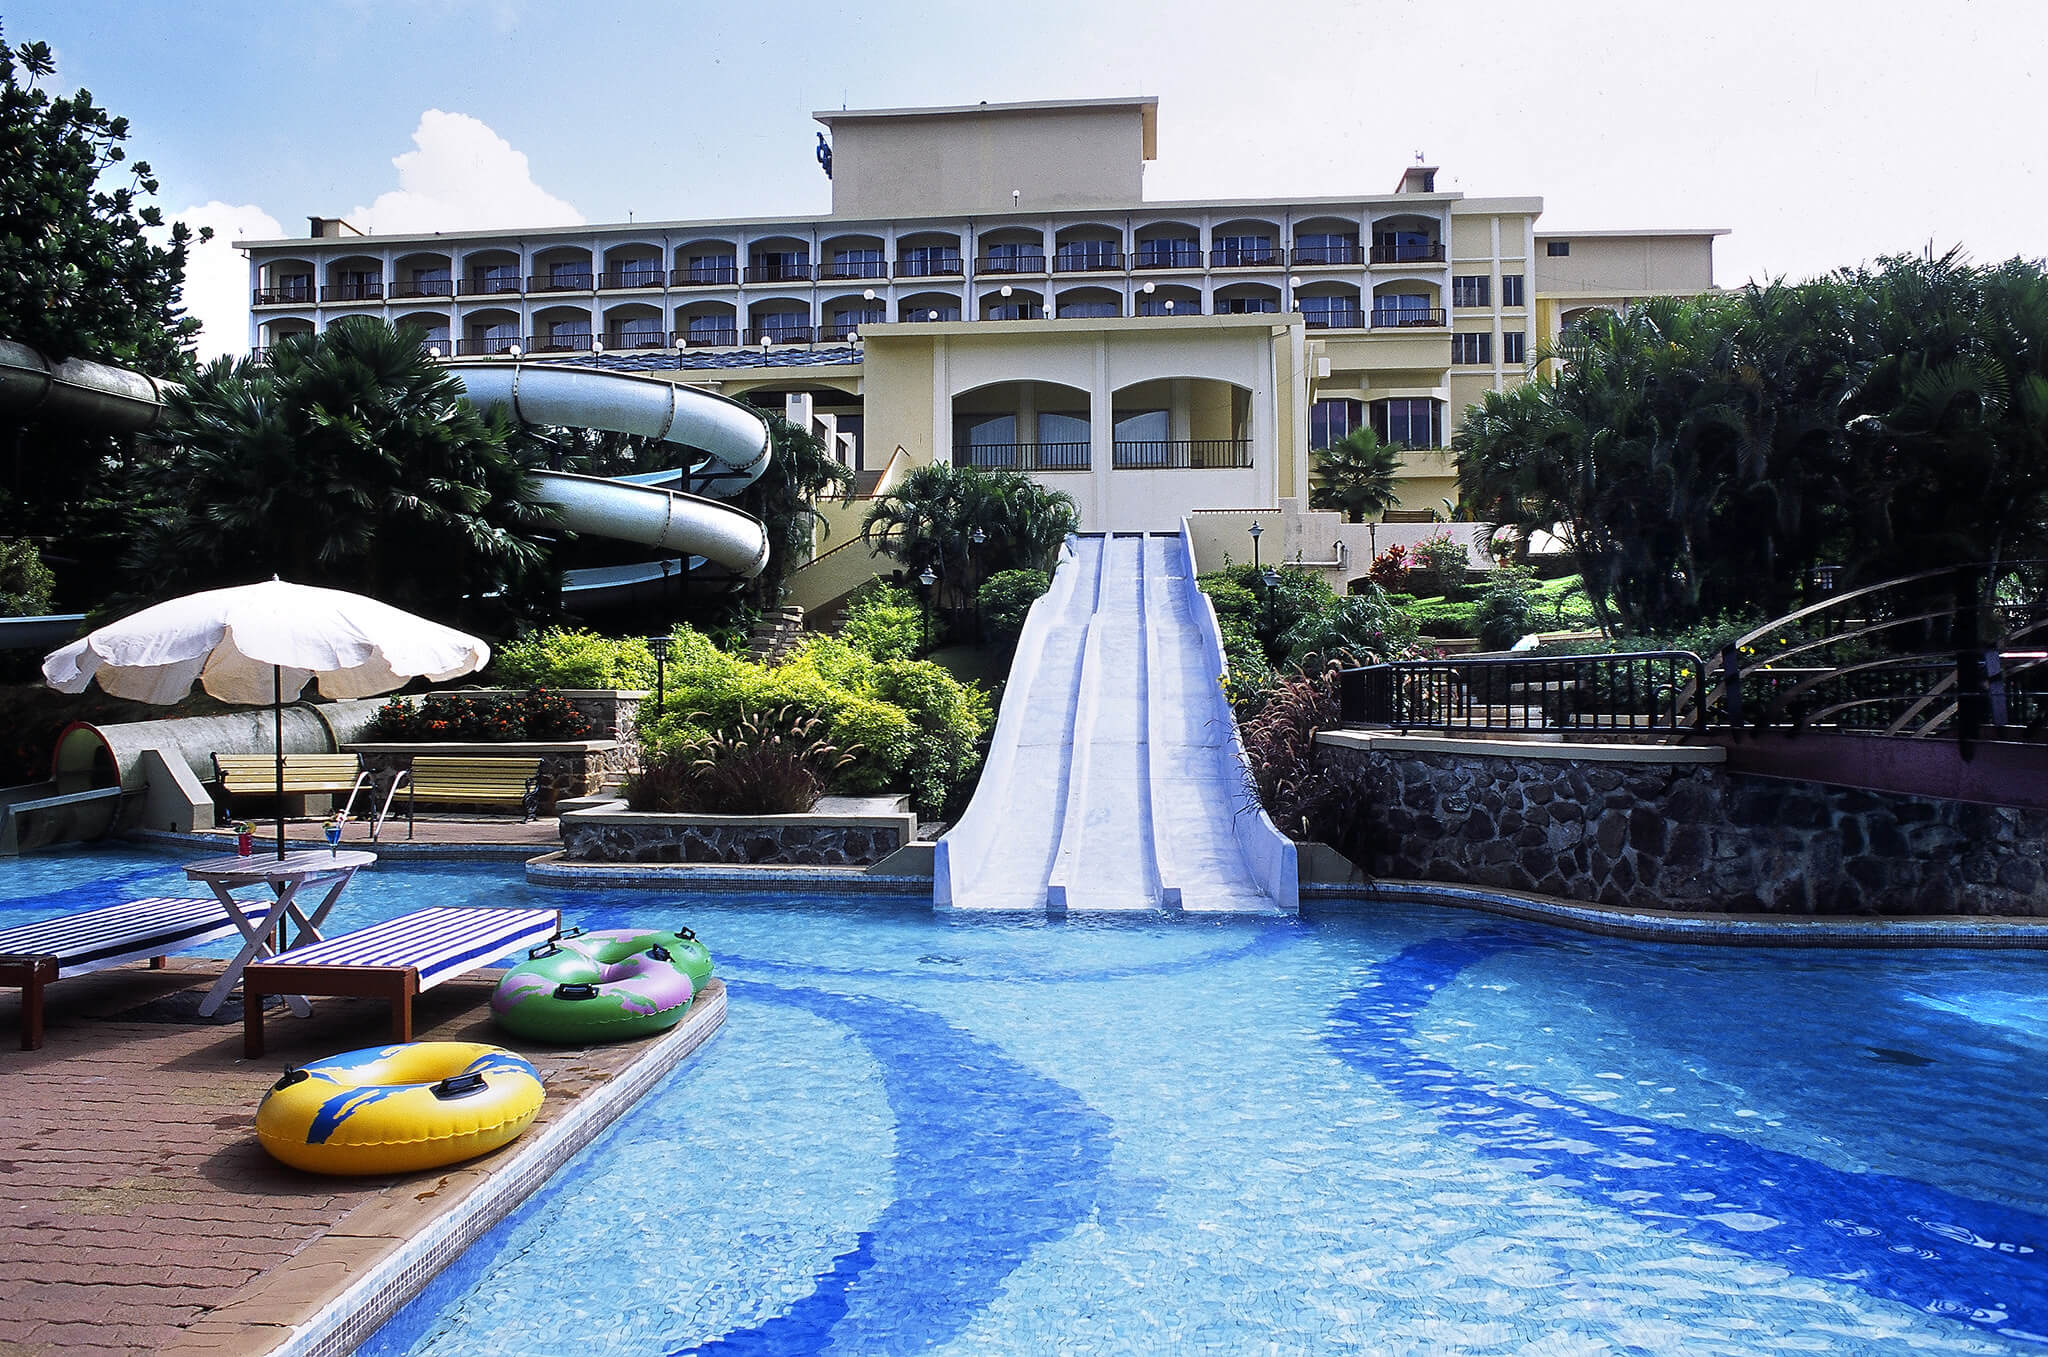 Fariyas resort lonavala photos fariyas resort pictures - Hotel with private swimming pool in lonavala ...